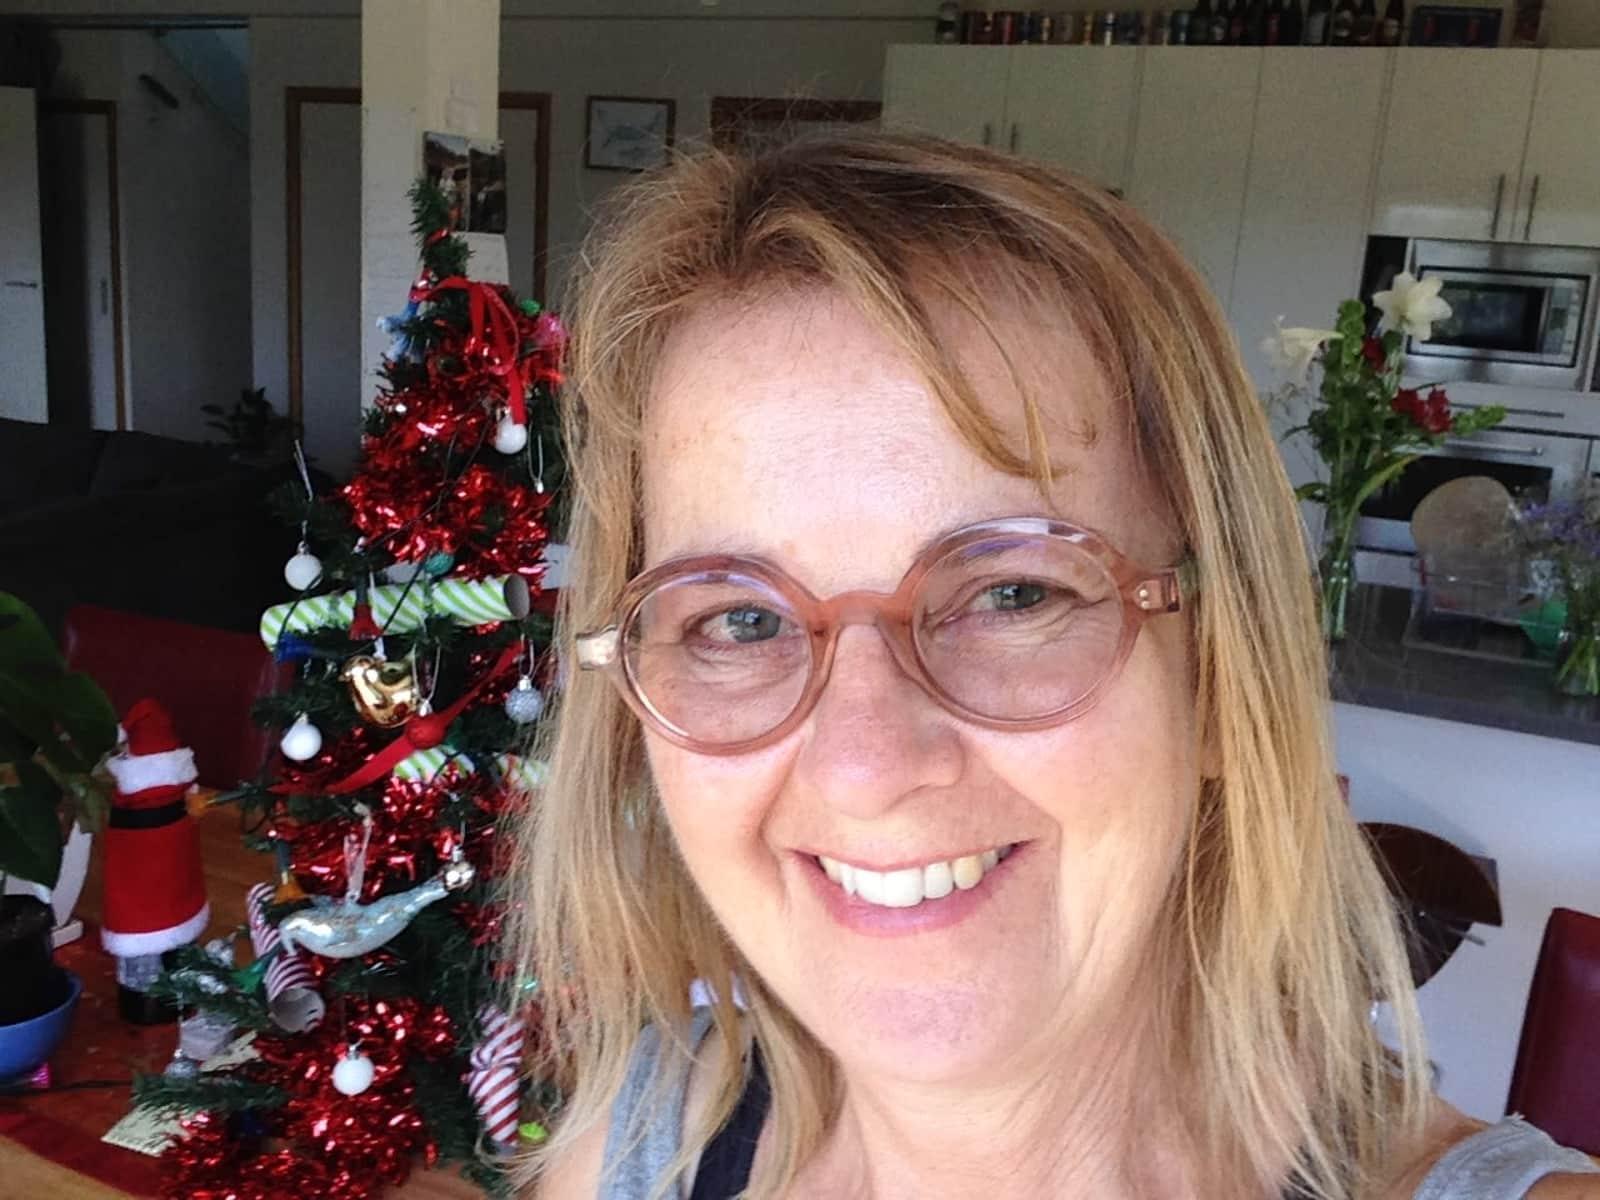 Anne from Hobart, Tasmania, Australia